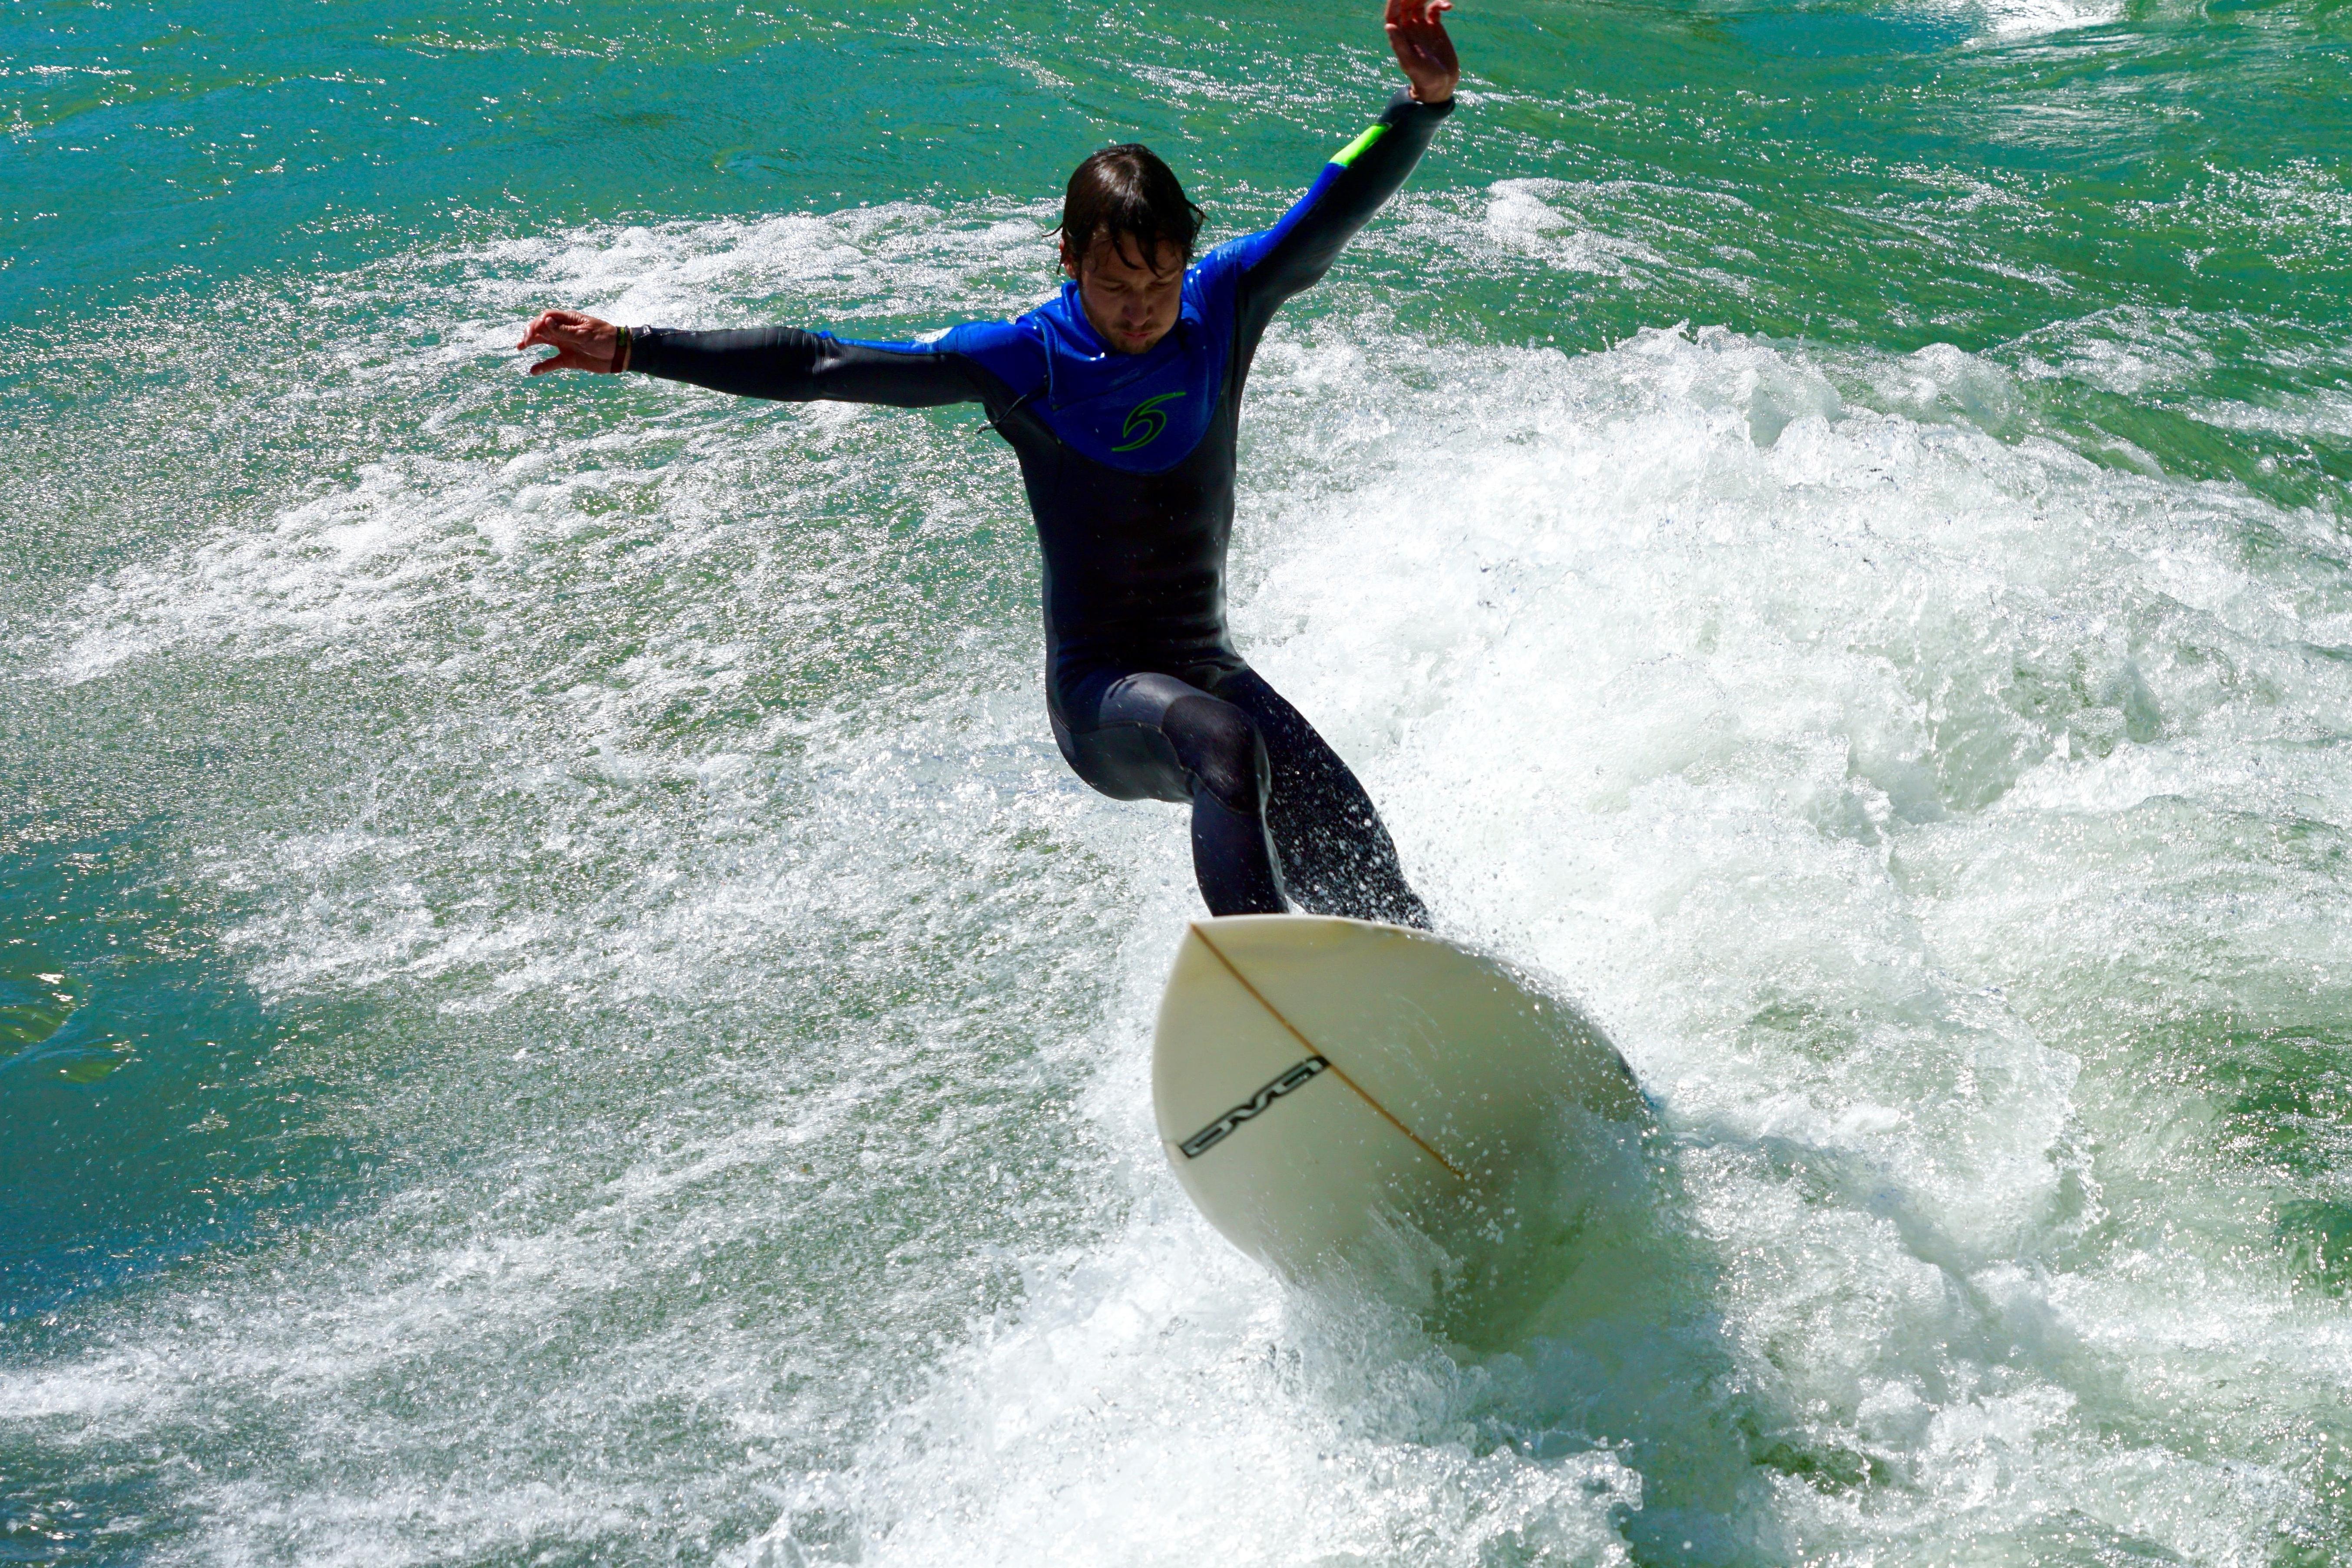 Superb Water, Ocean, Beach, Sea, Summer, Joy, Extreme, Wave, Surfer, Sport